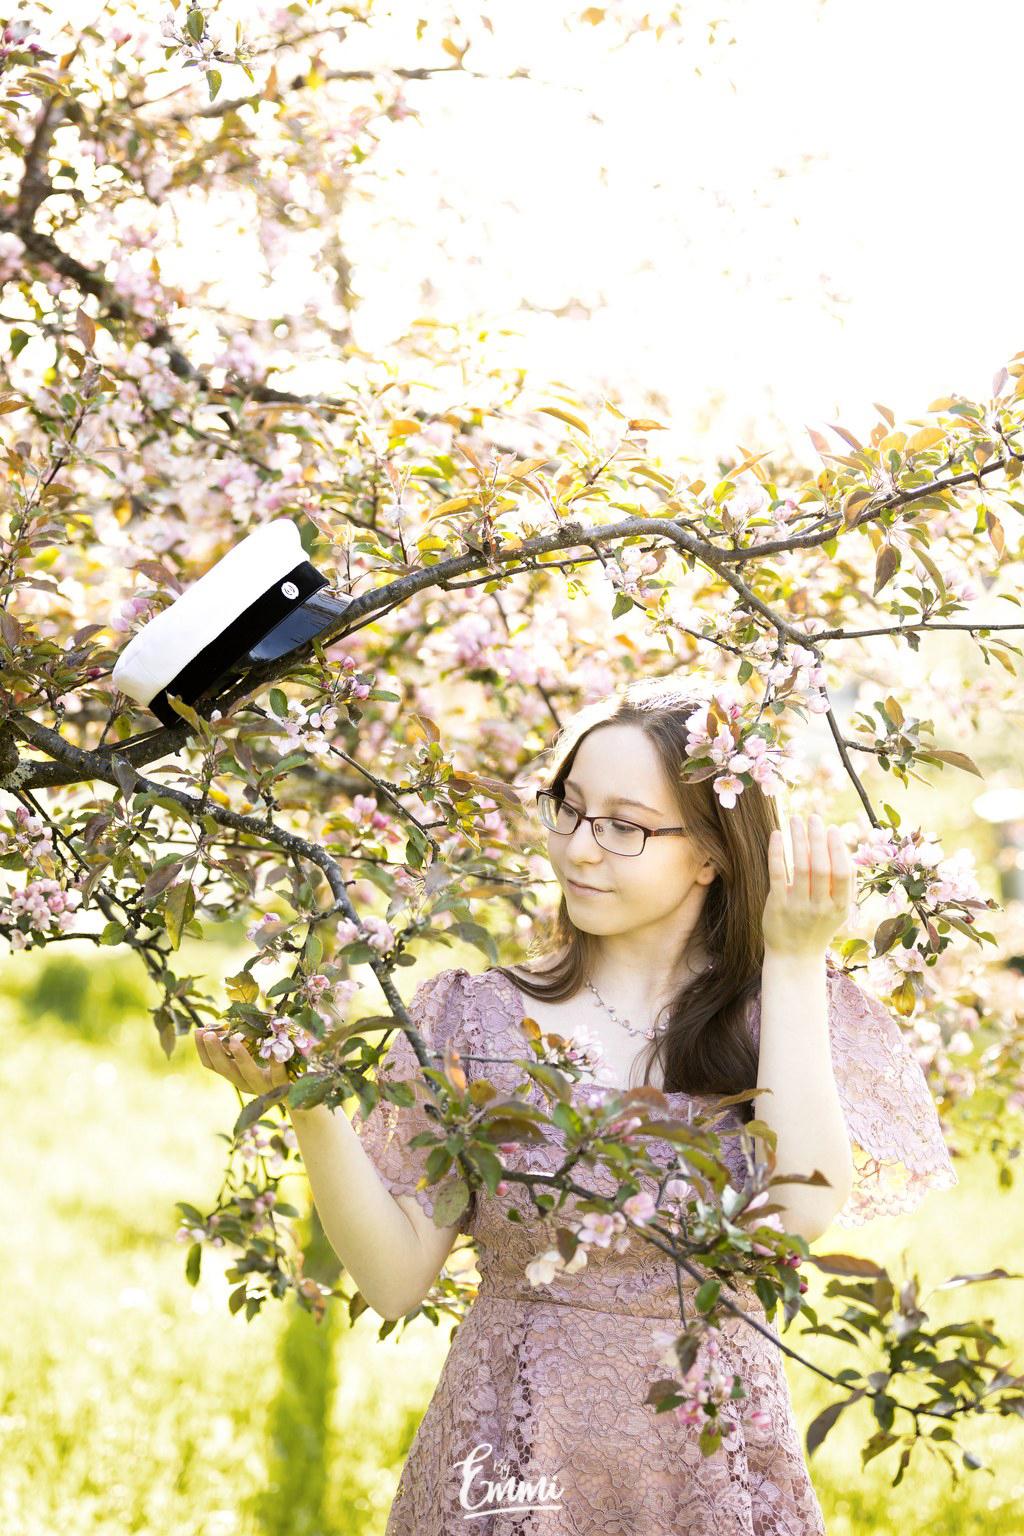 Ylioppilaskuvaus omenapuutarhassa